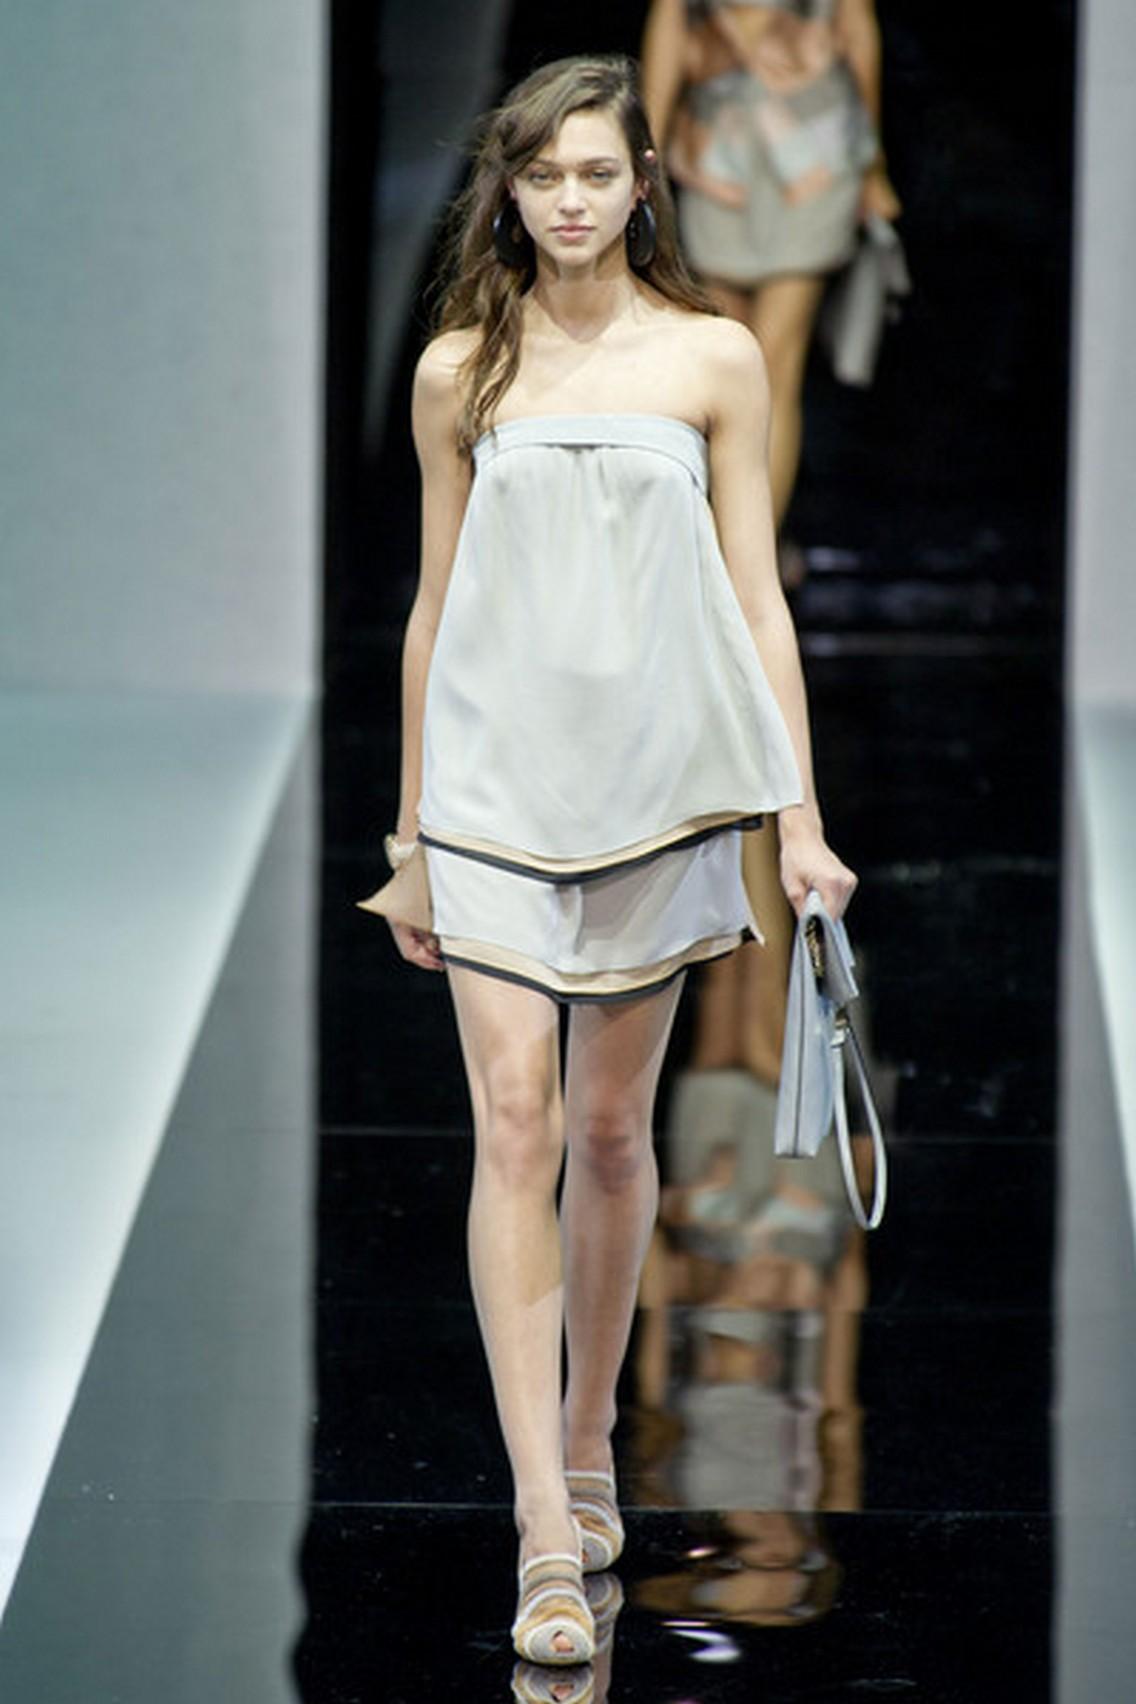 Emporio Armani 2014 milan fashion week Day 3 and 4 Highlights, Milan Fashion Week, Spring Summer 2014 Emporio Armani Spring Summer 2014 2